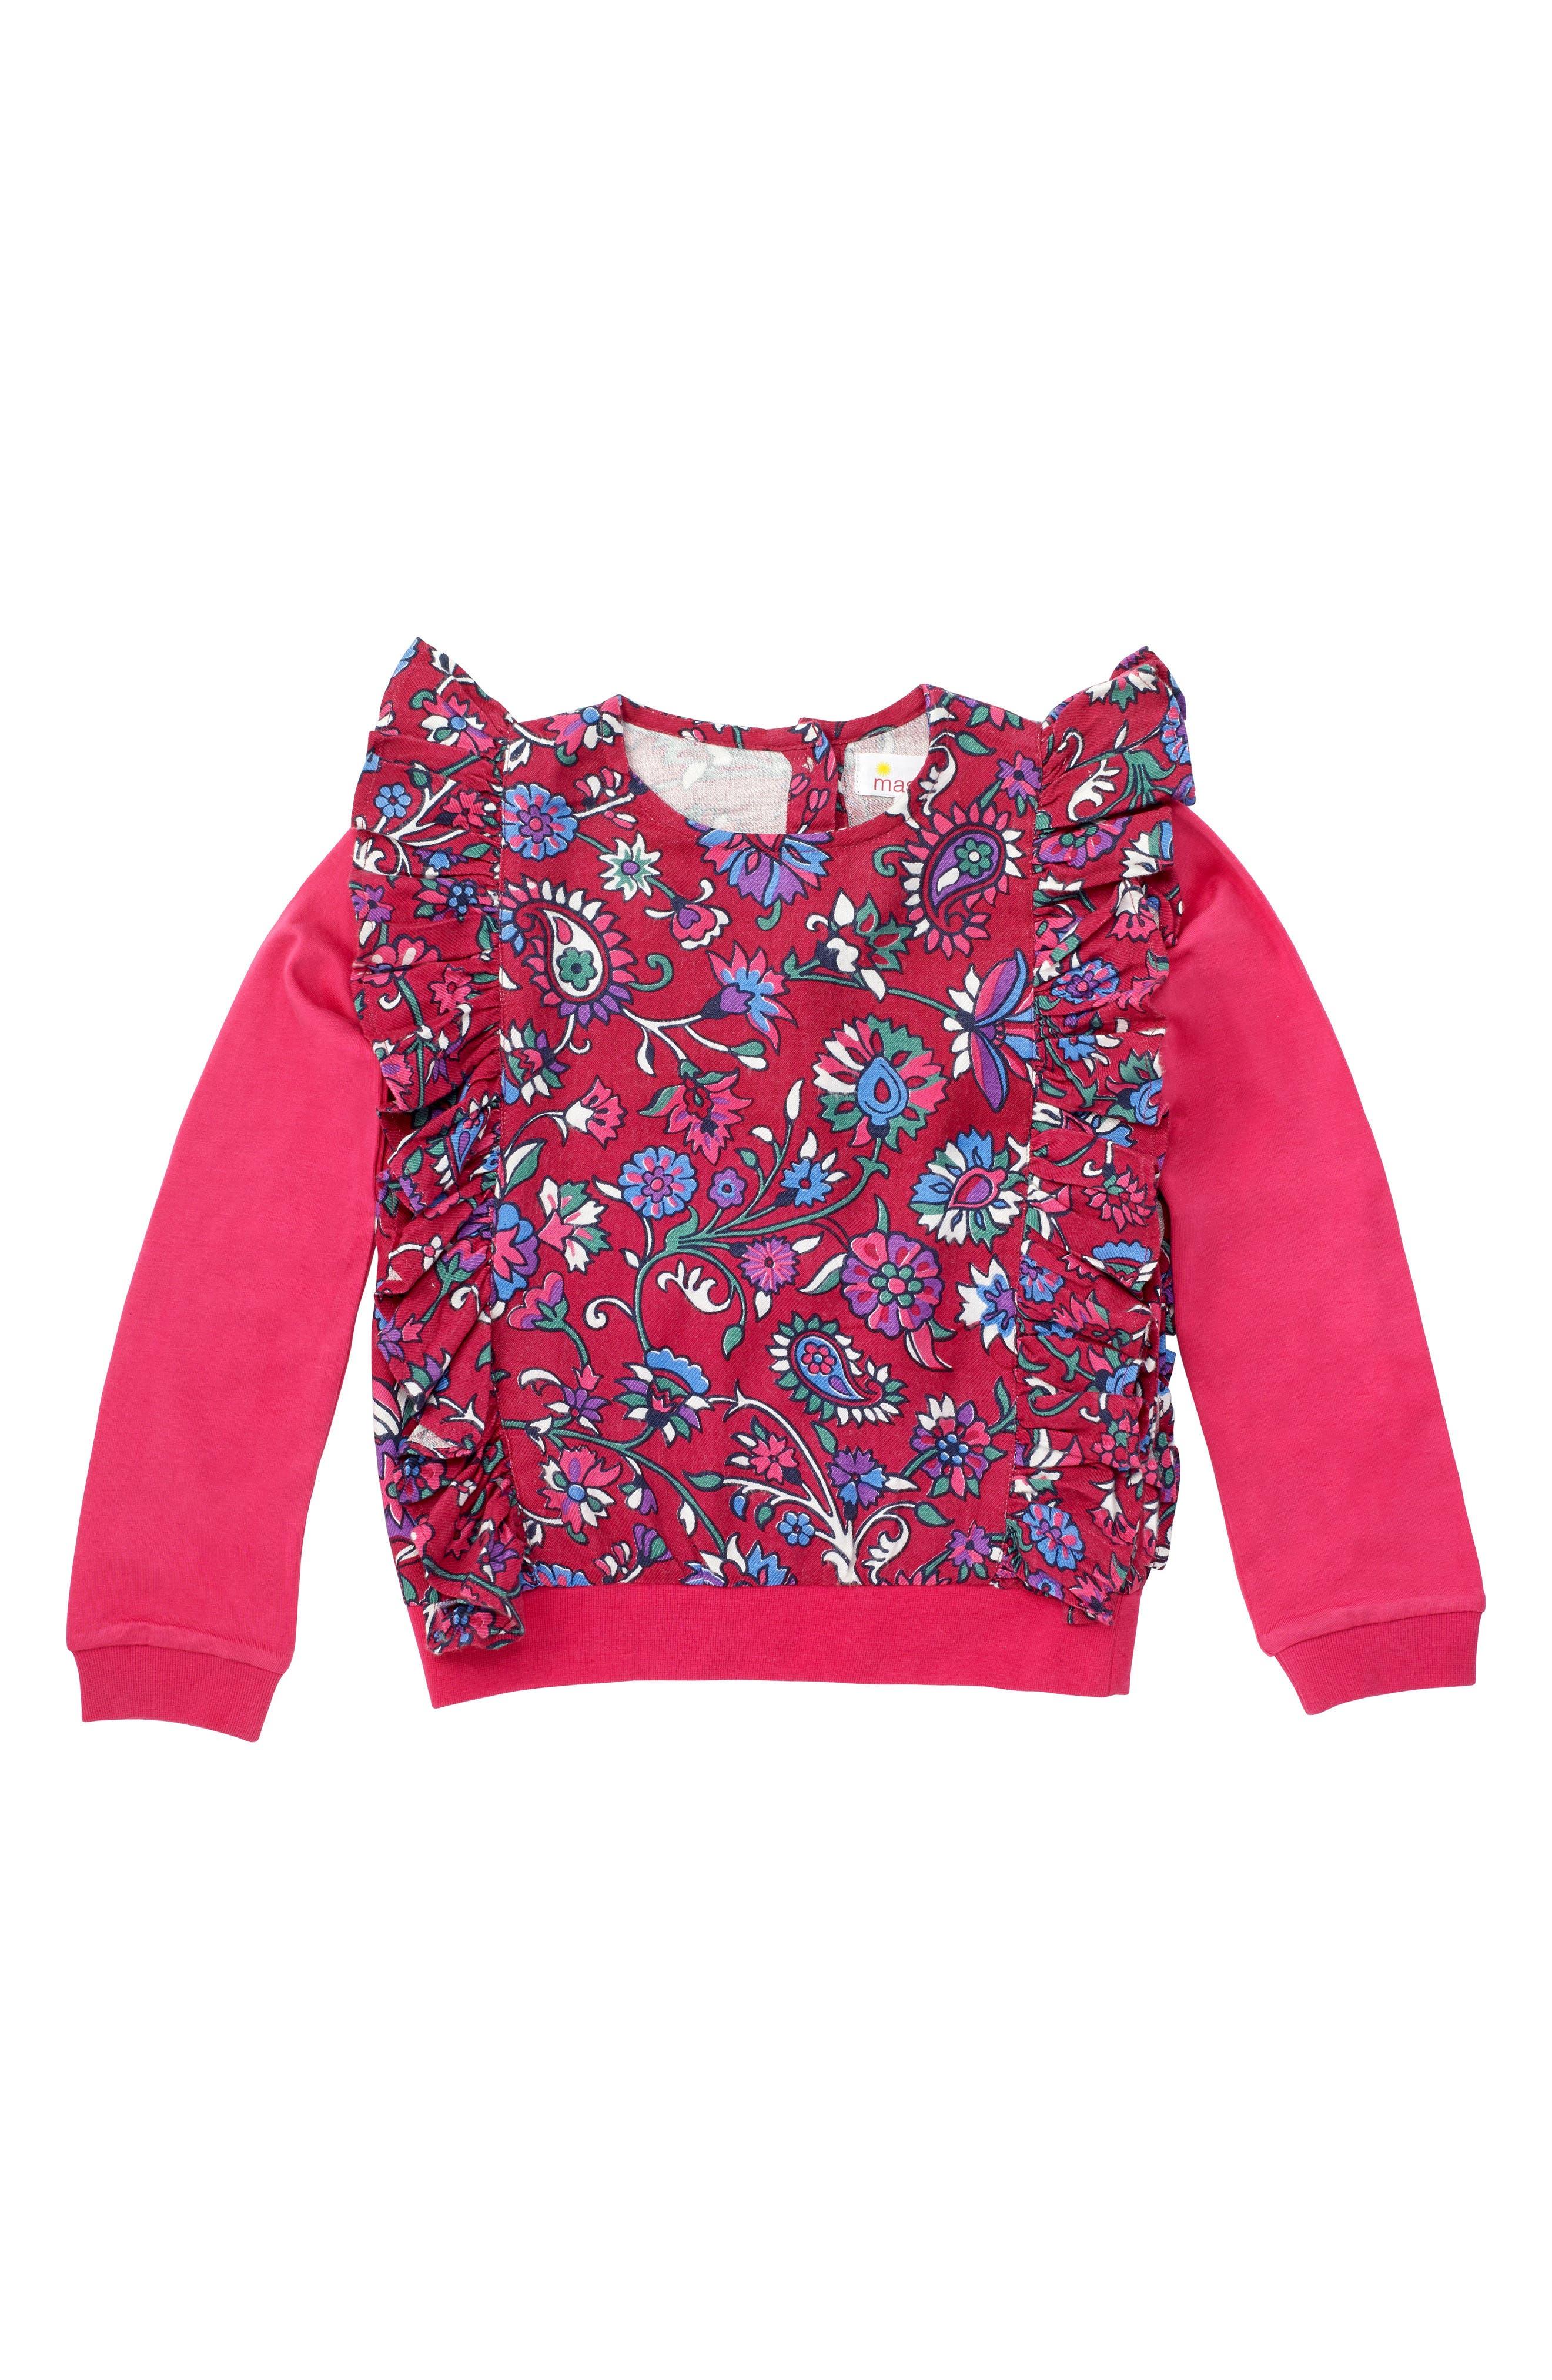 Main Image - Masalababy Floral Ruffle Top (Toddler Girls, Little Girls & Big Girls)